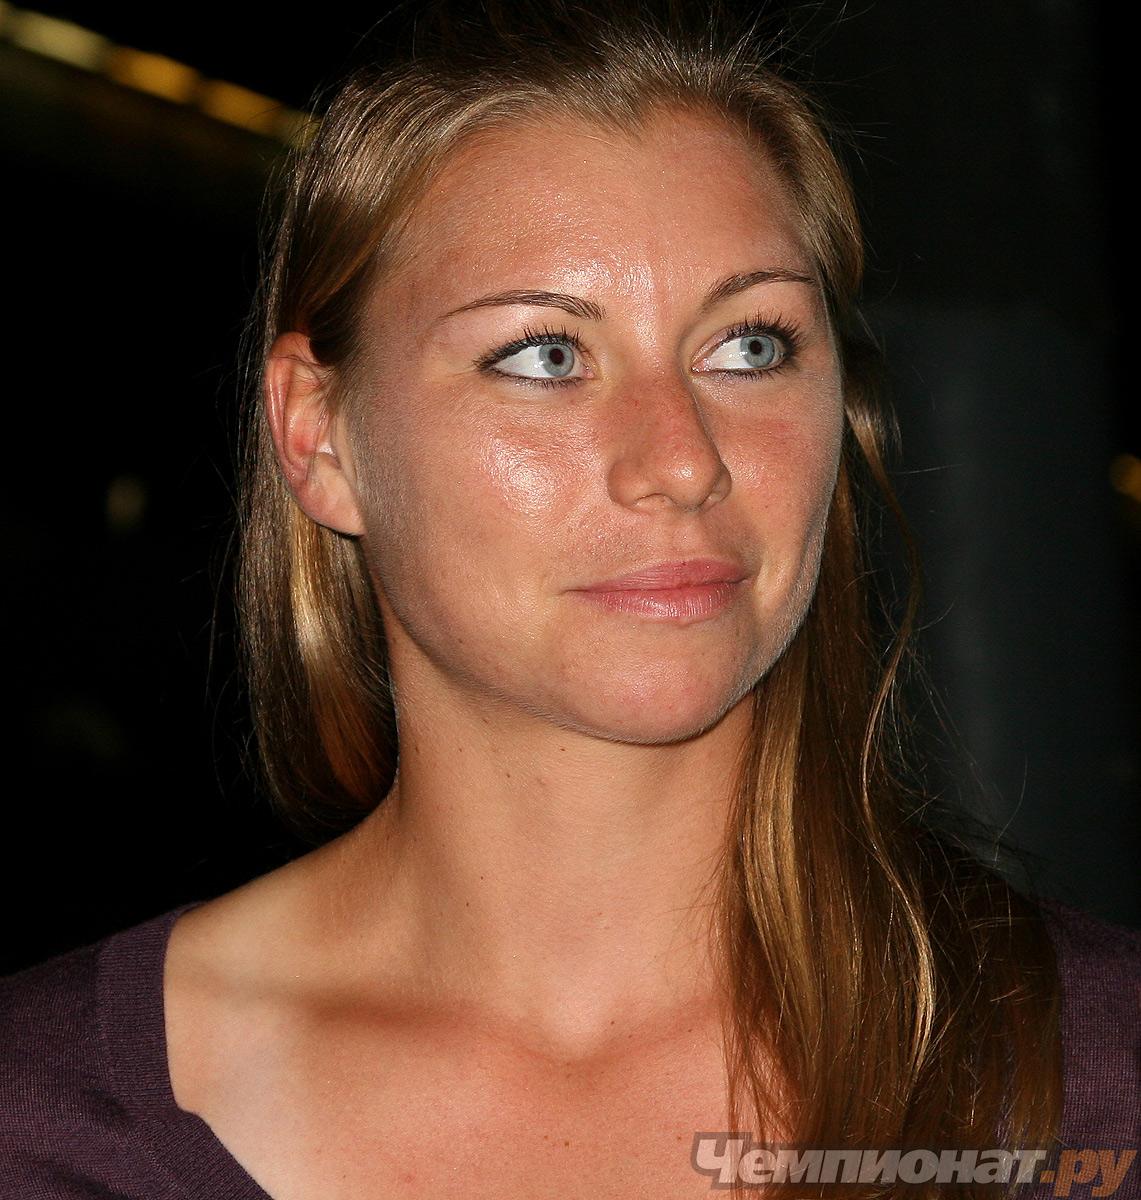 Вера Звонарьова стига №2 в ранглистата при полуфинал